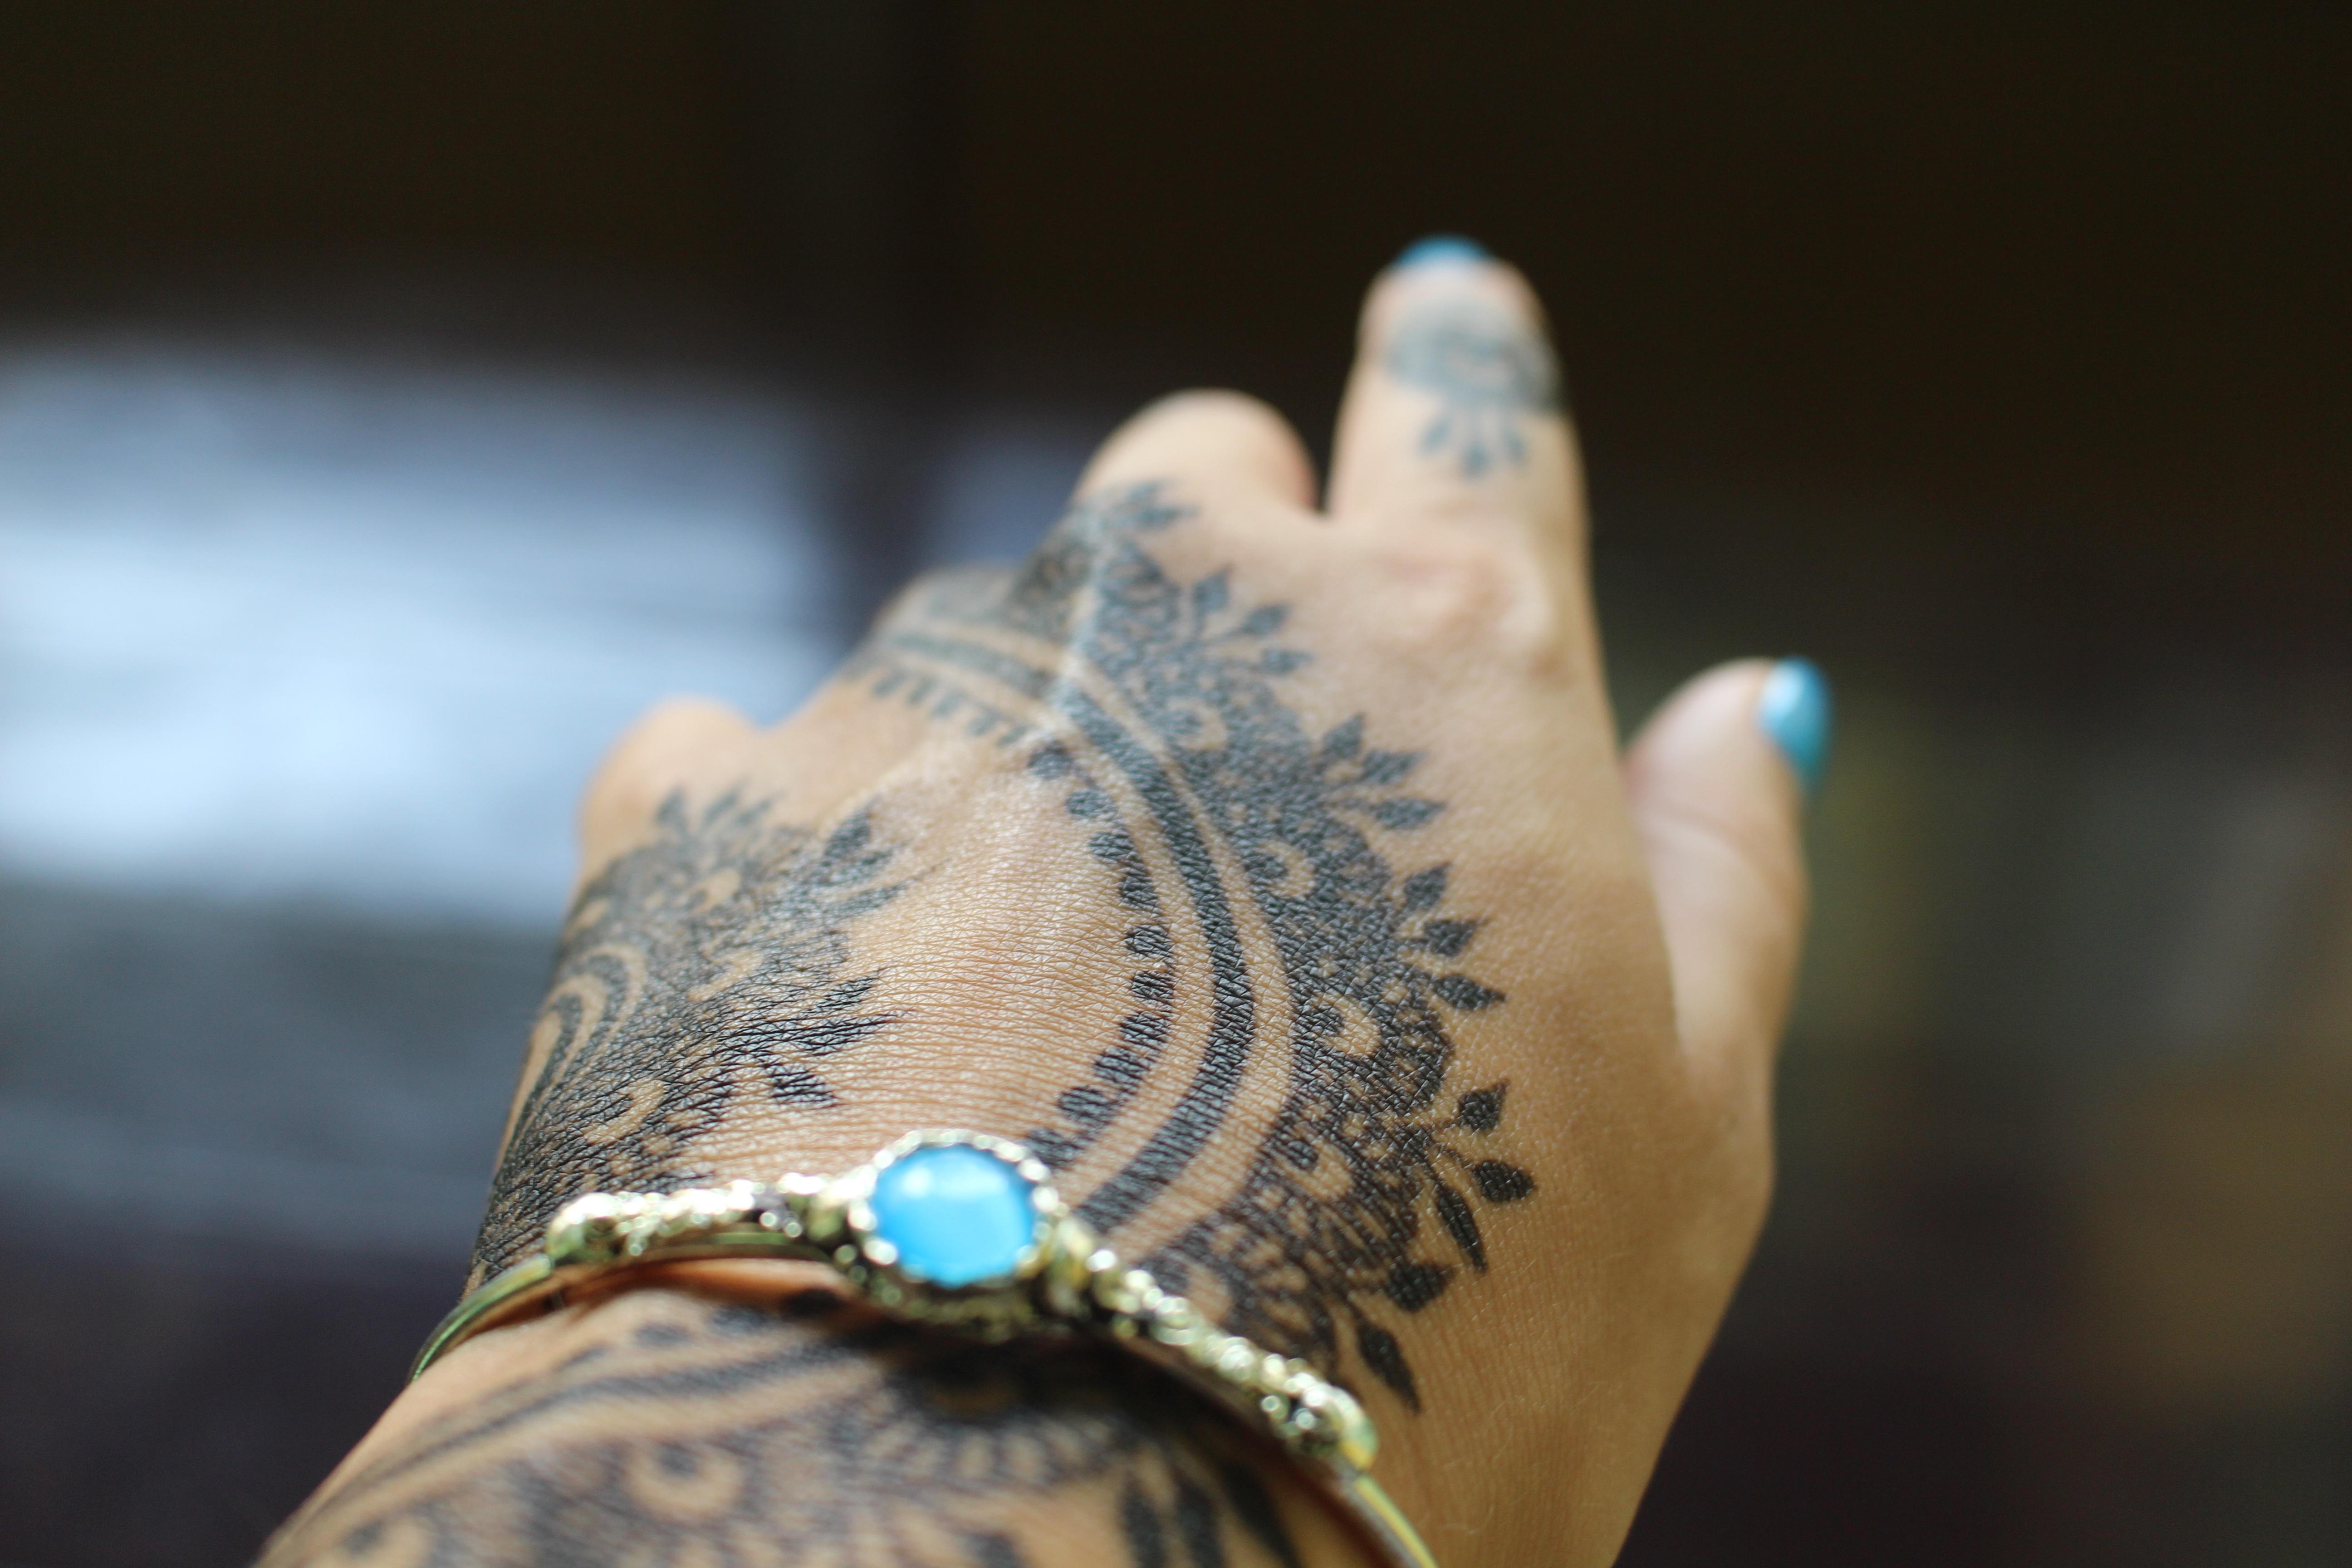 Gambar Tangan Pola Jari Inai Warna Asia Biru Lengan